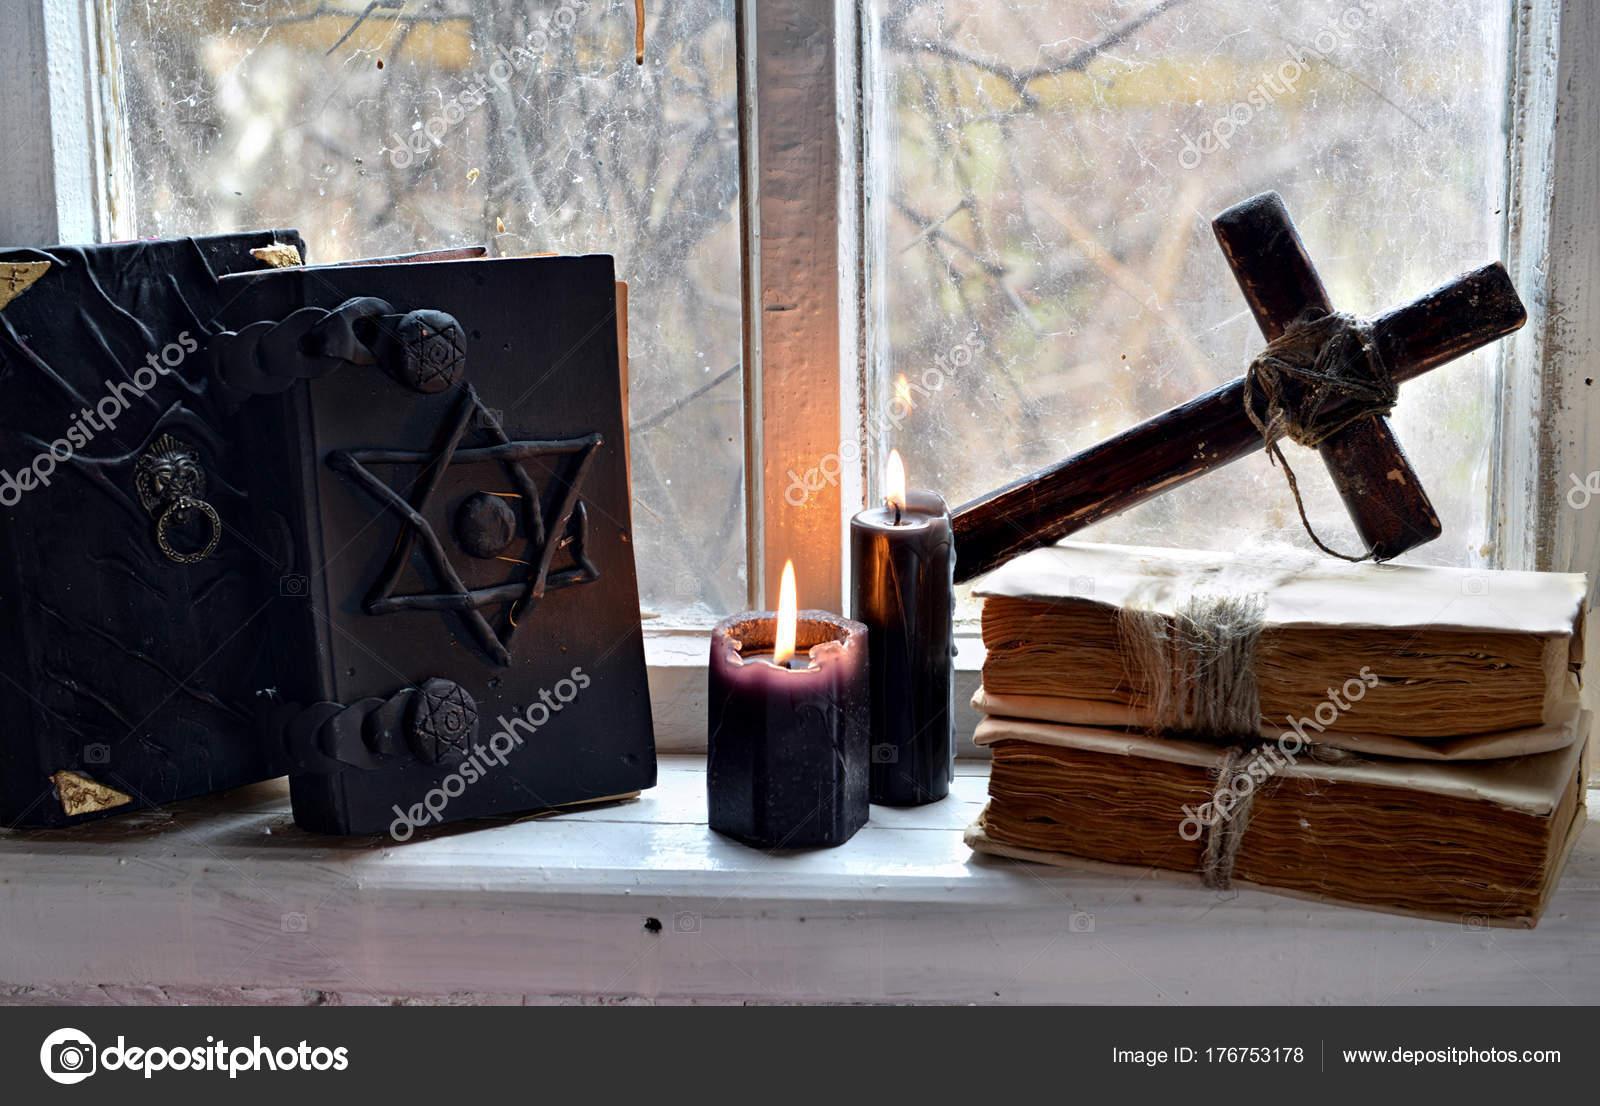 Black Magic Books Black Candles Cross Old Window Occult